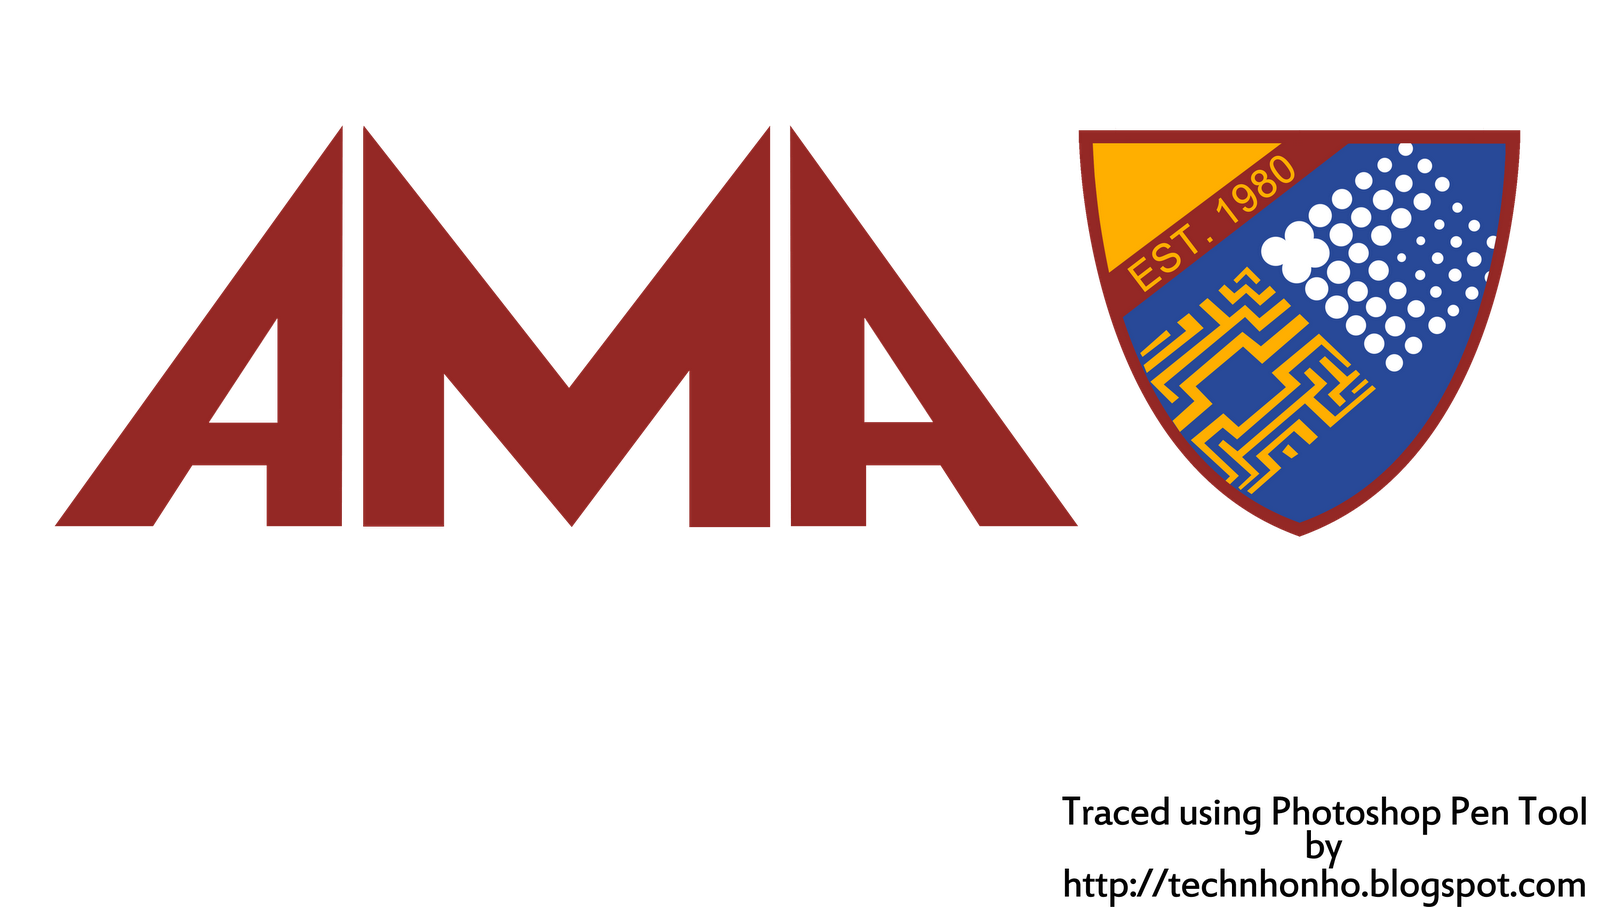 High Resolution AMA Computer University Logo by TechNHO ~ Technhology ...